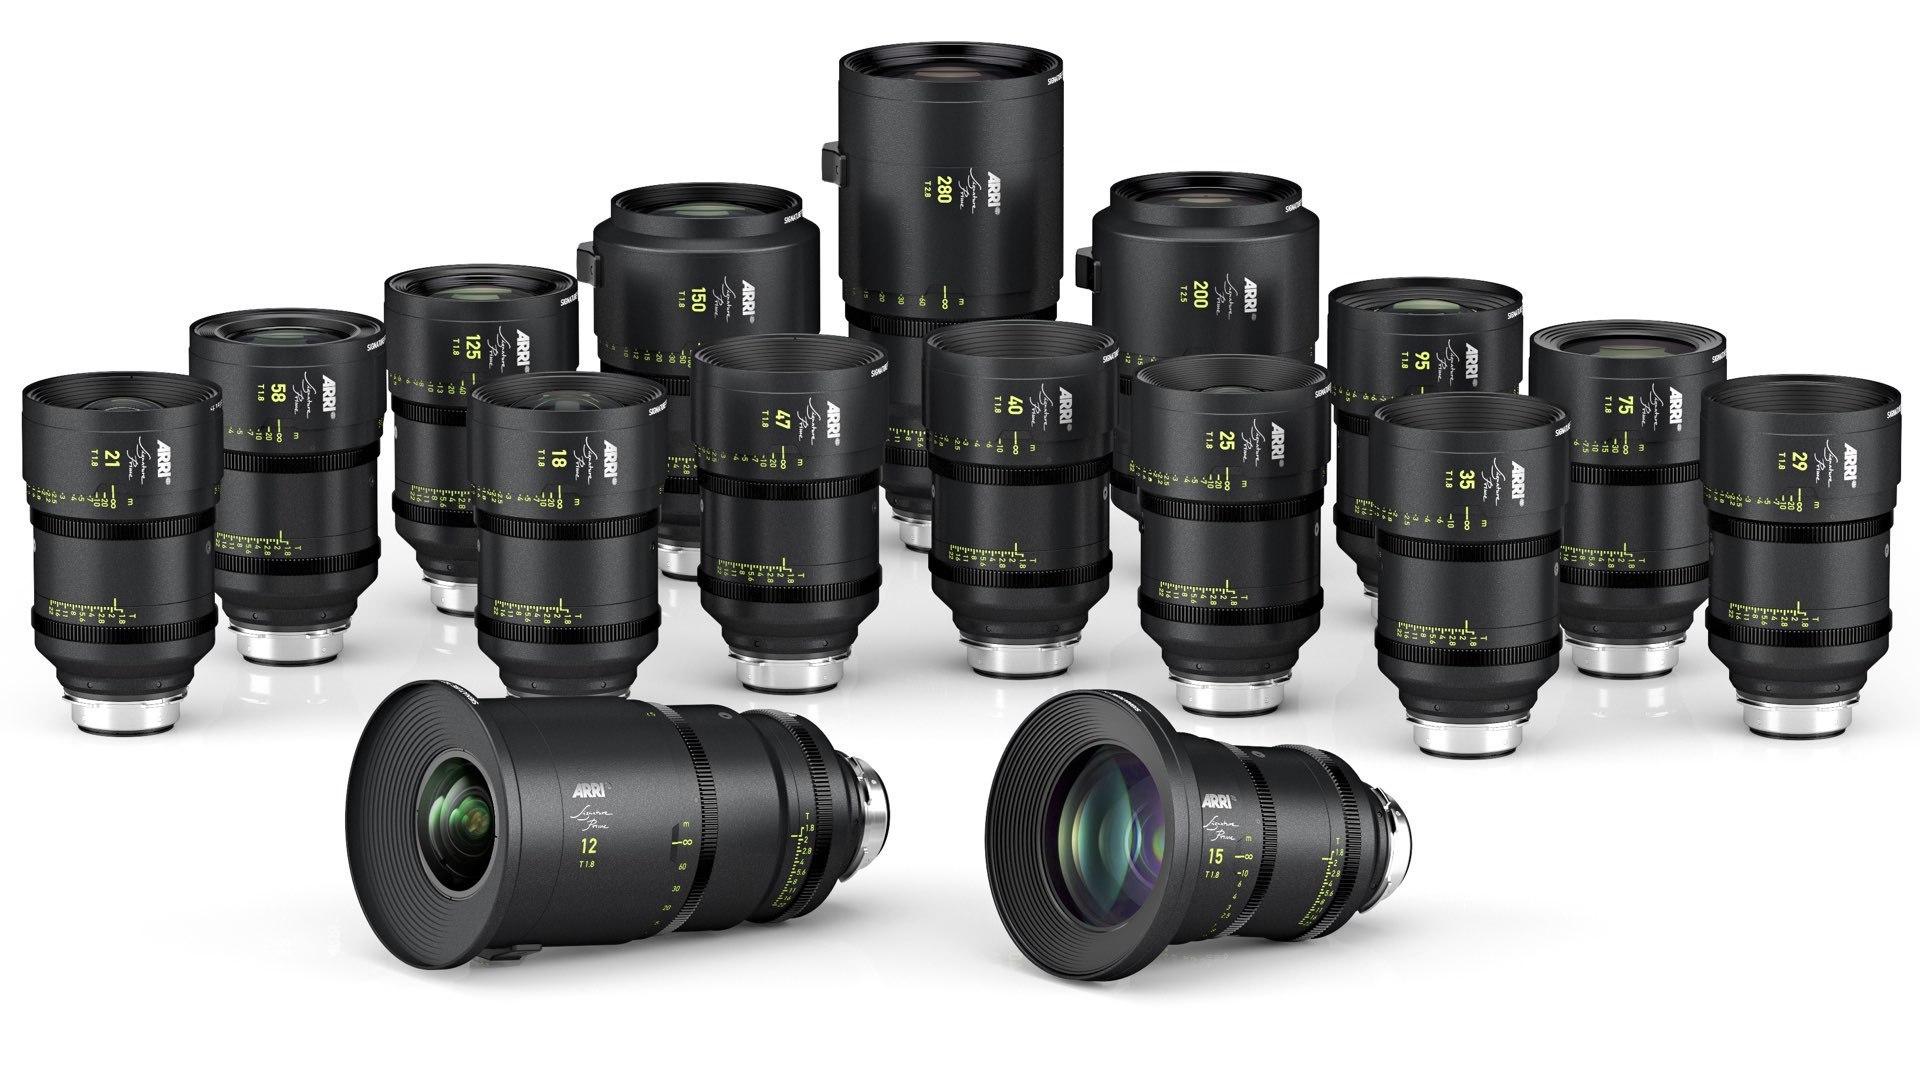 Arri Signature Prime full frame lenses